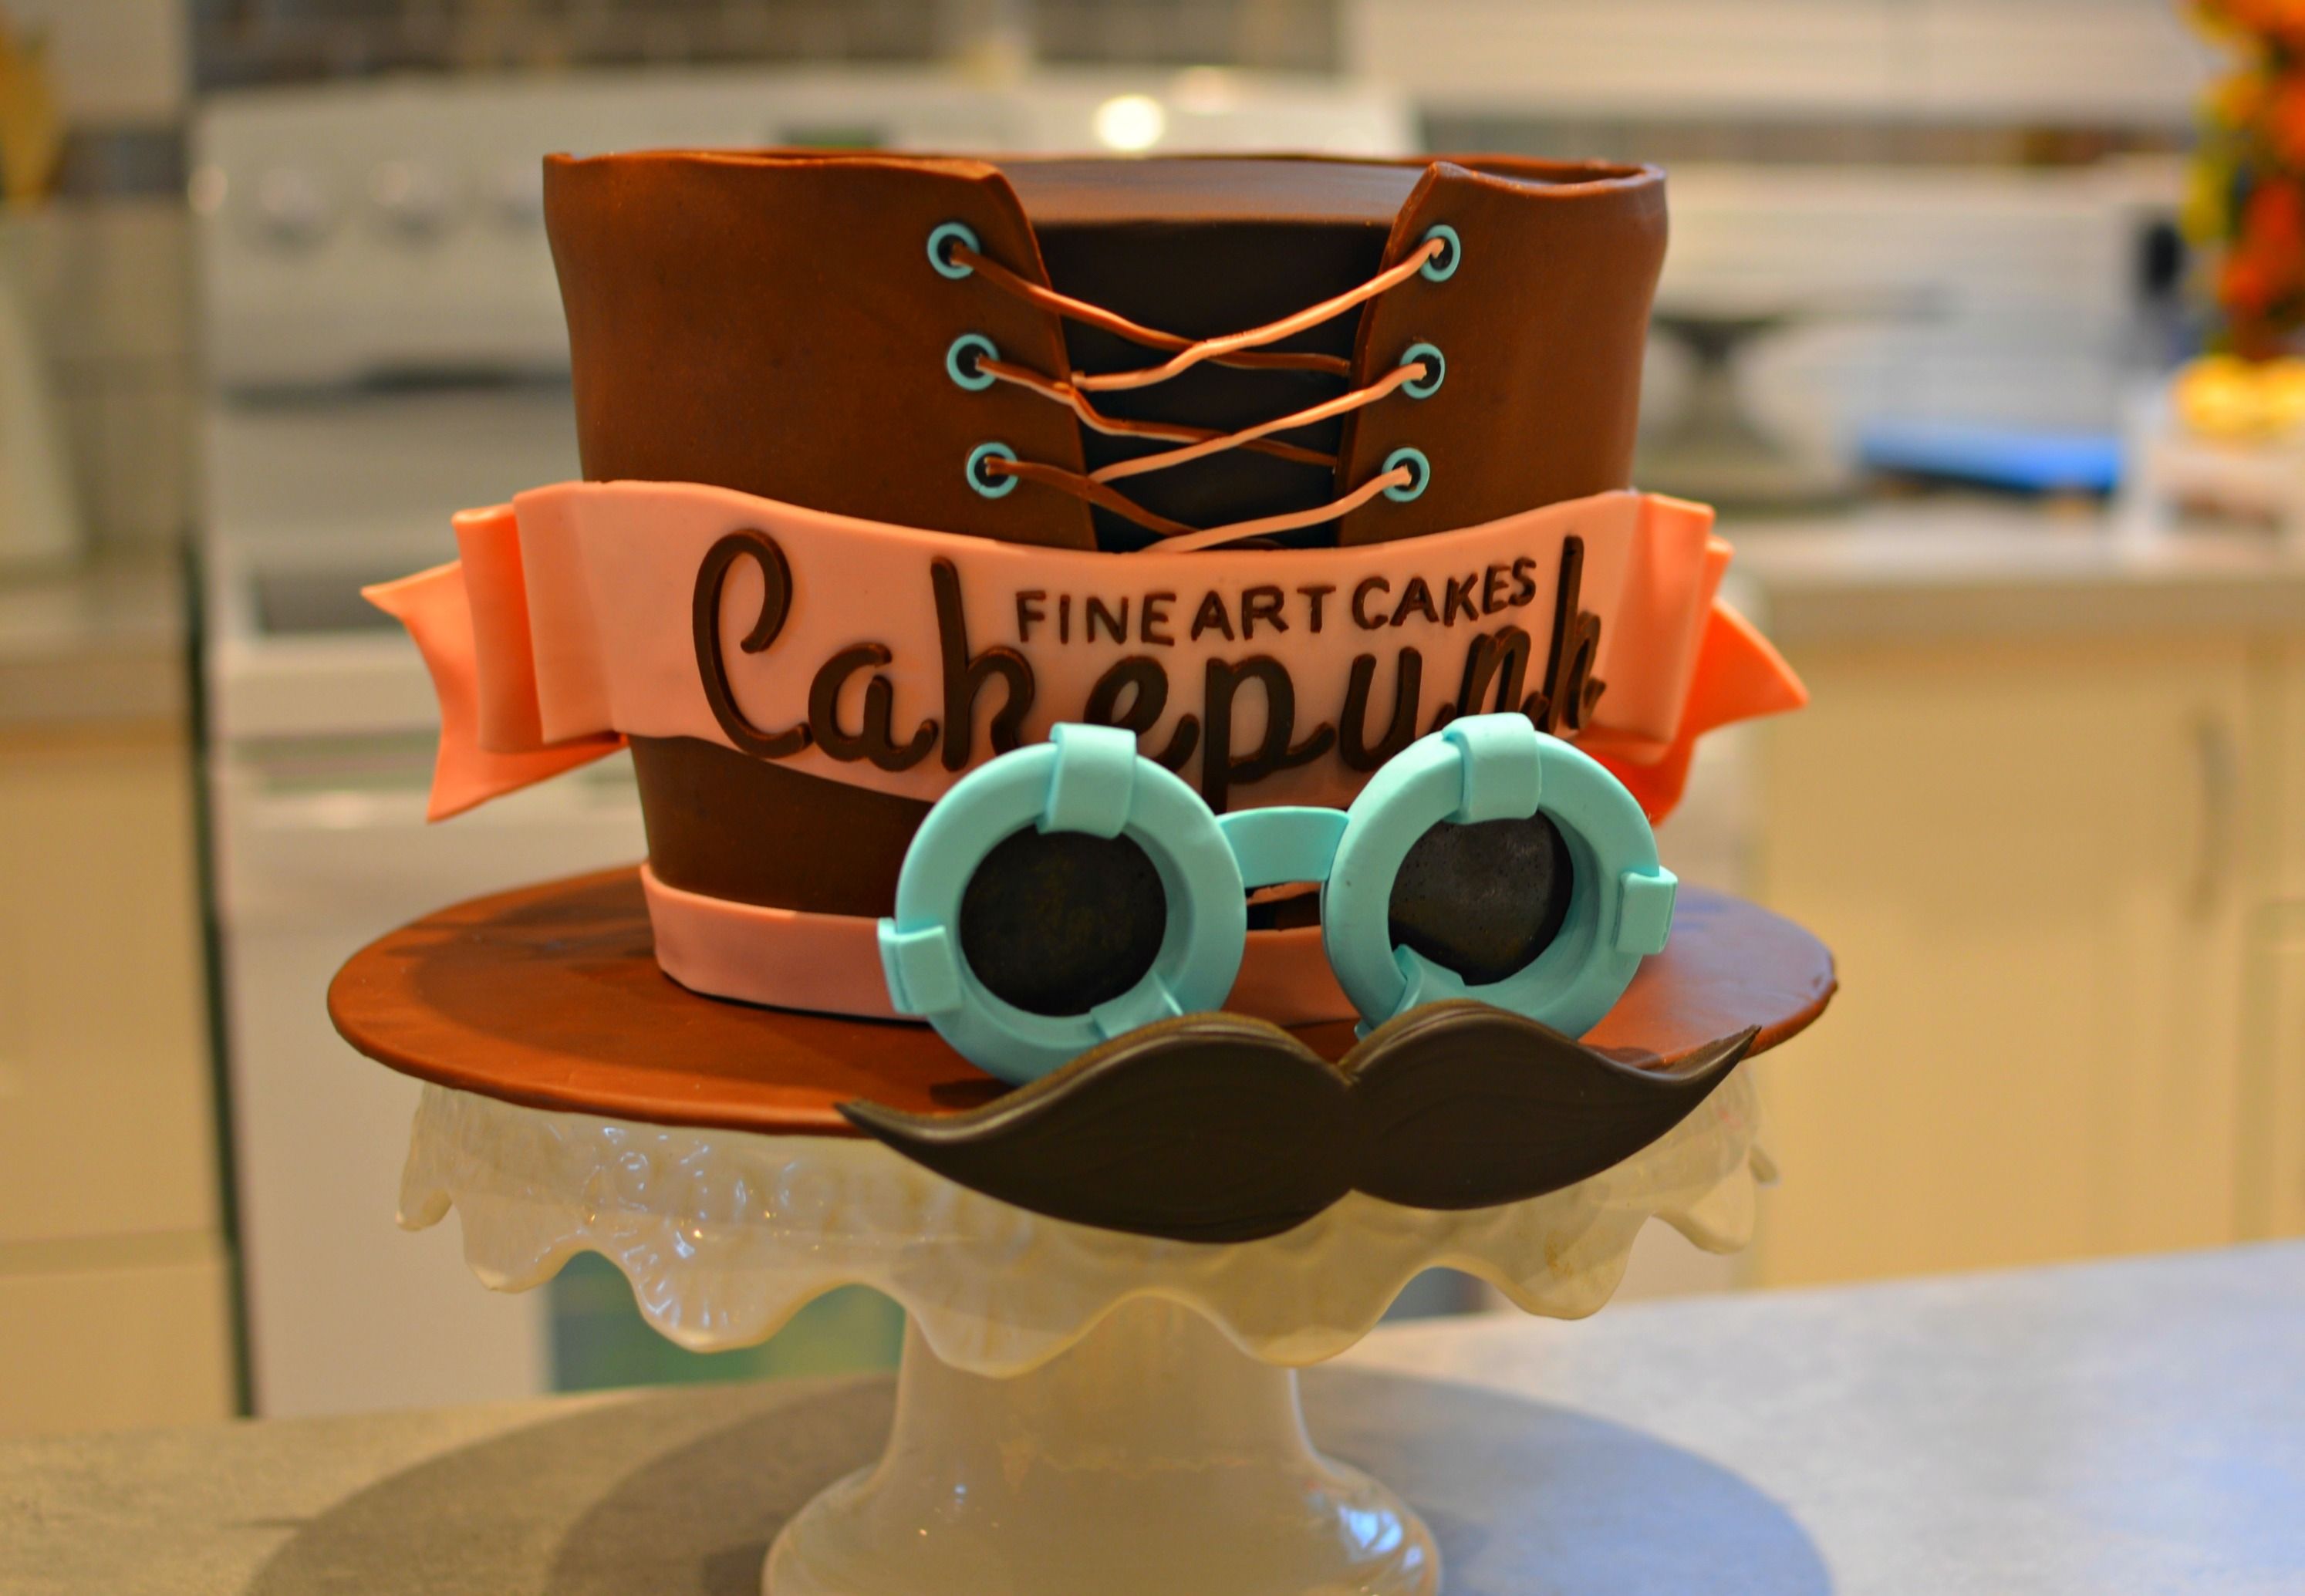 Cakepunk Logo in Cake